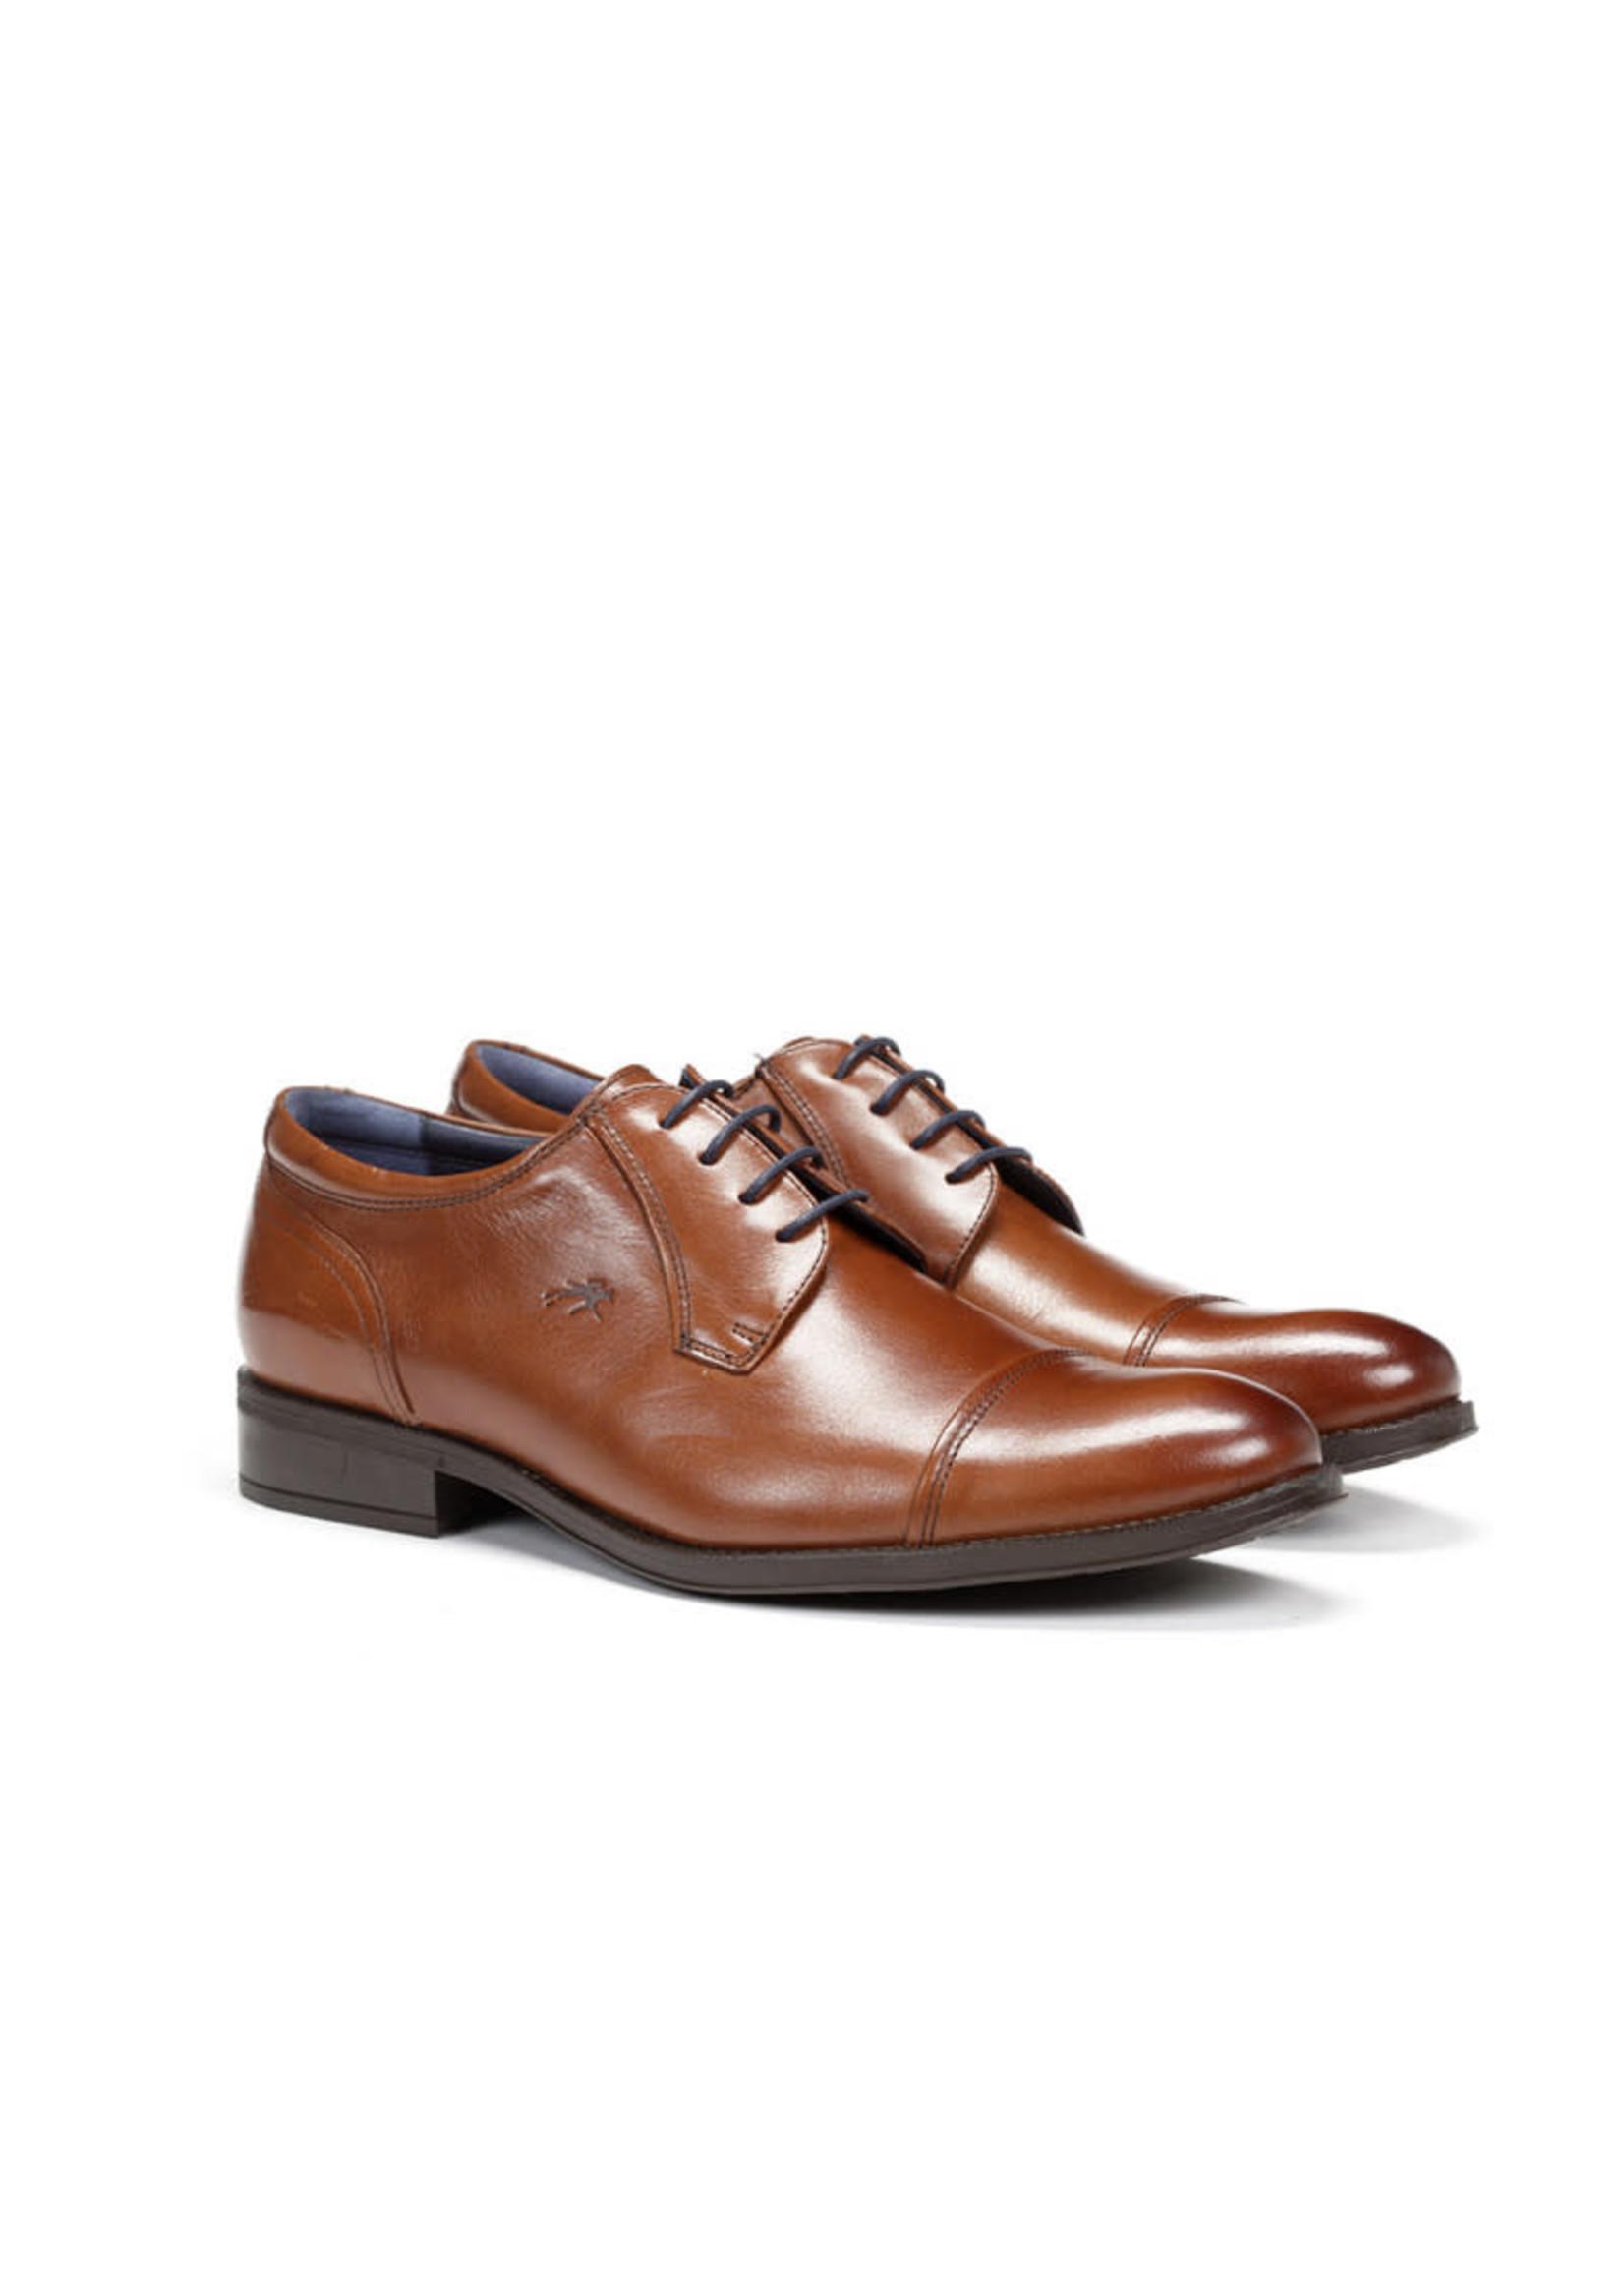 Fluchos 15430 Heracles Fluchos Shoe